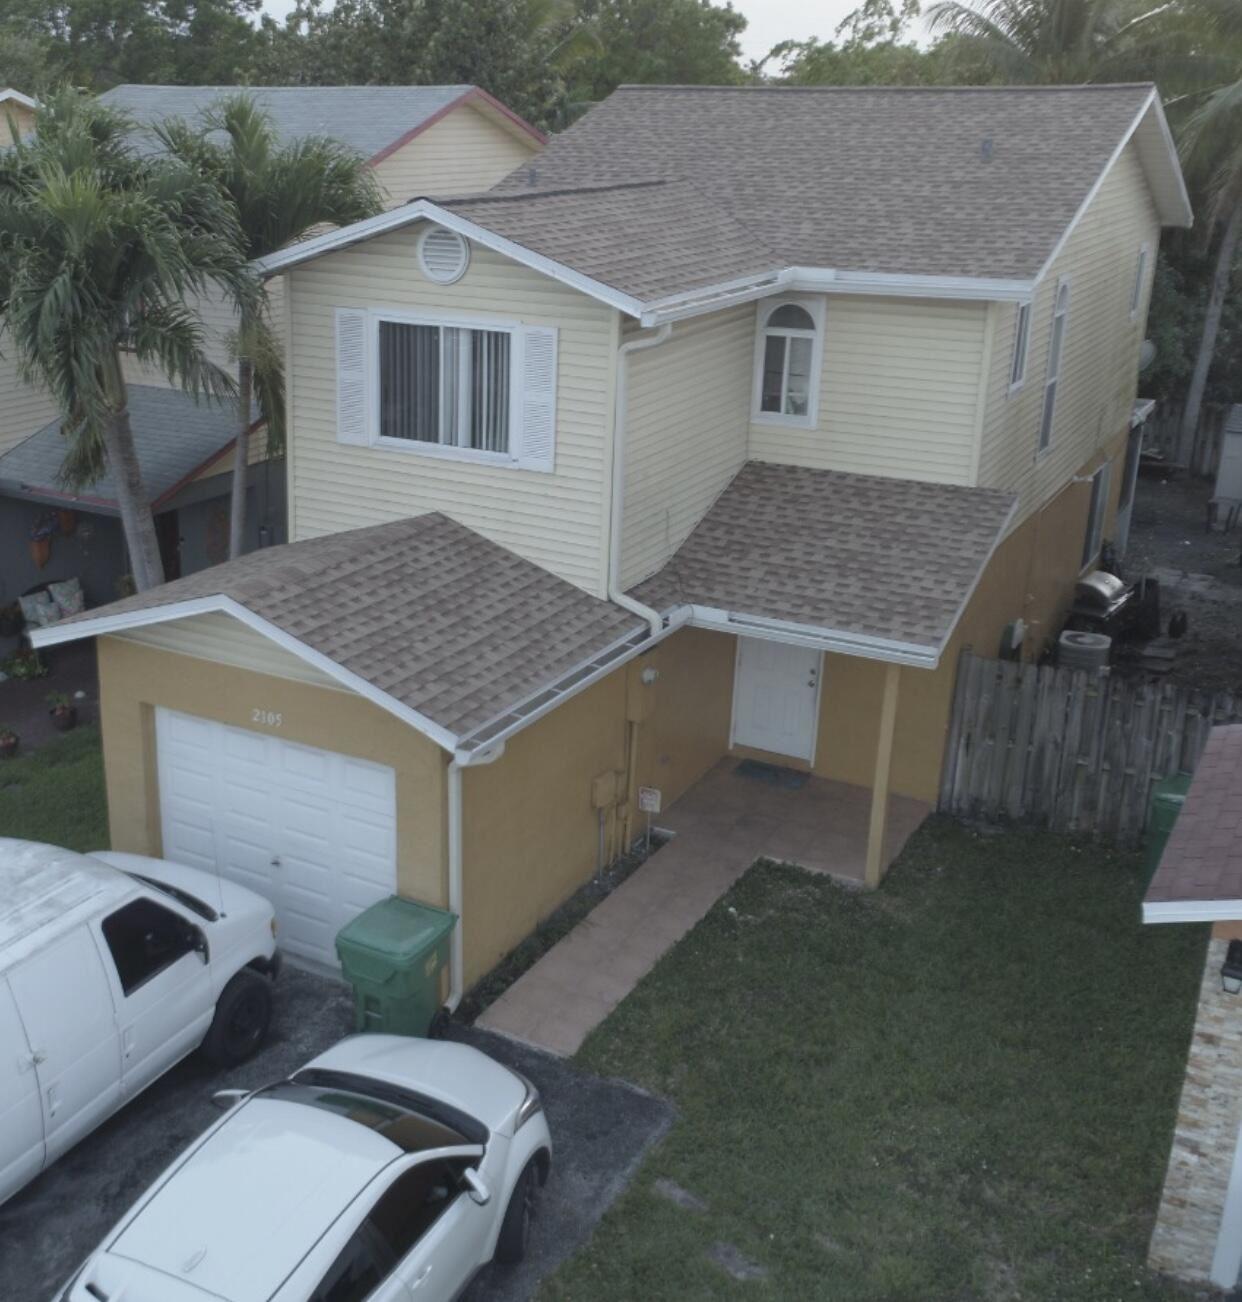 Photo of 2105 NW 55th Terrace, Lauderhill, FL 33313 (MLS # RX-10694829)